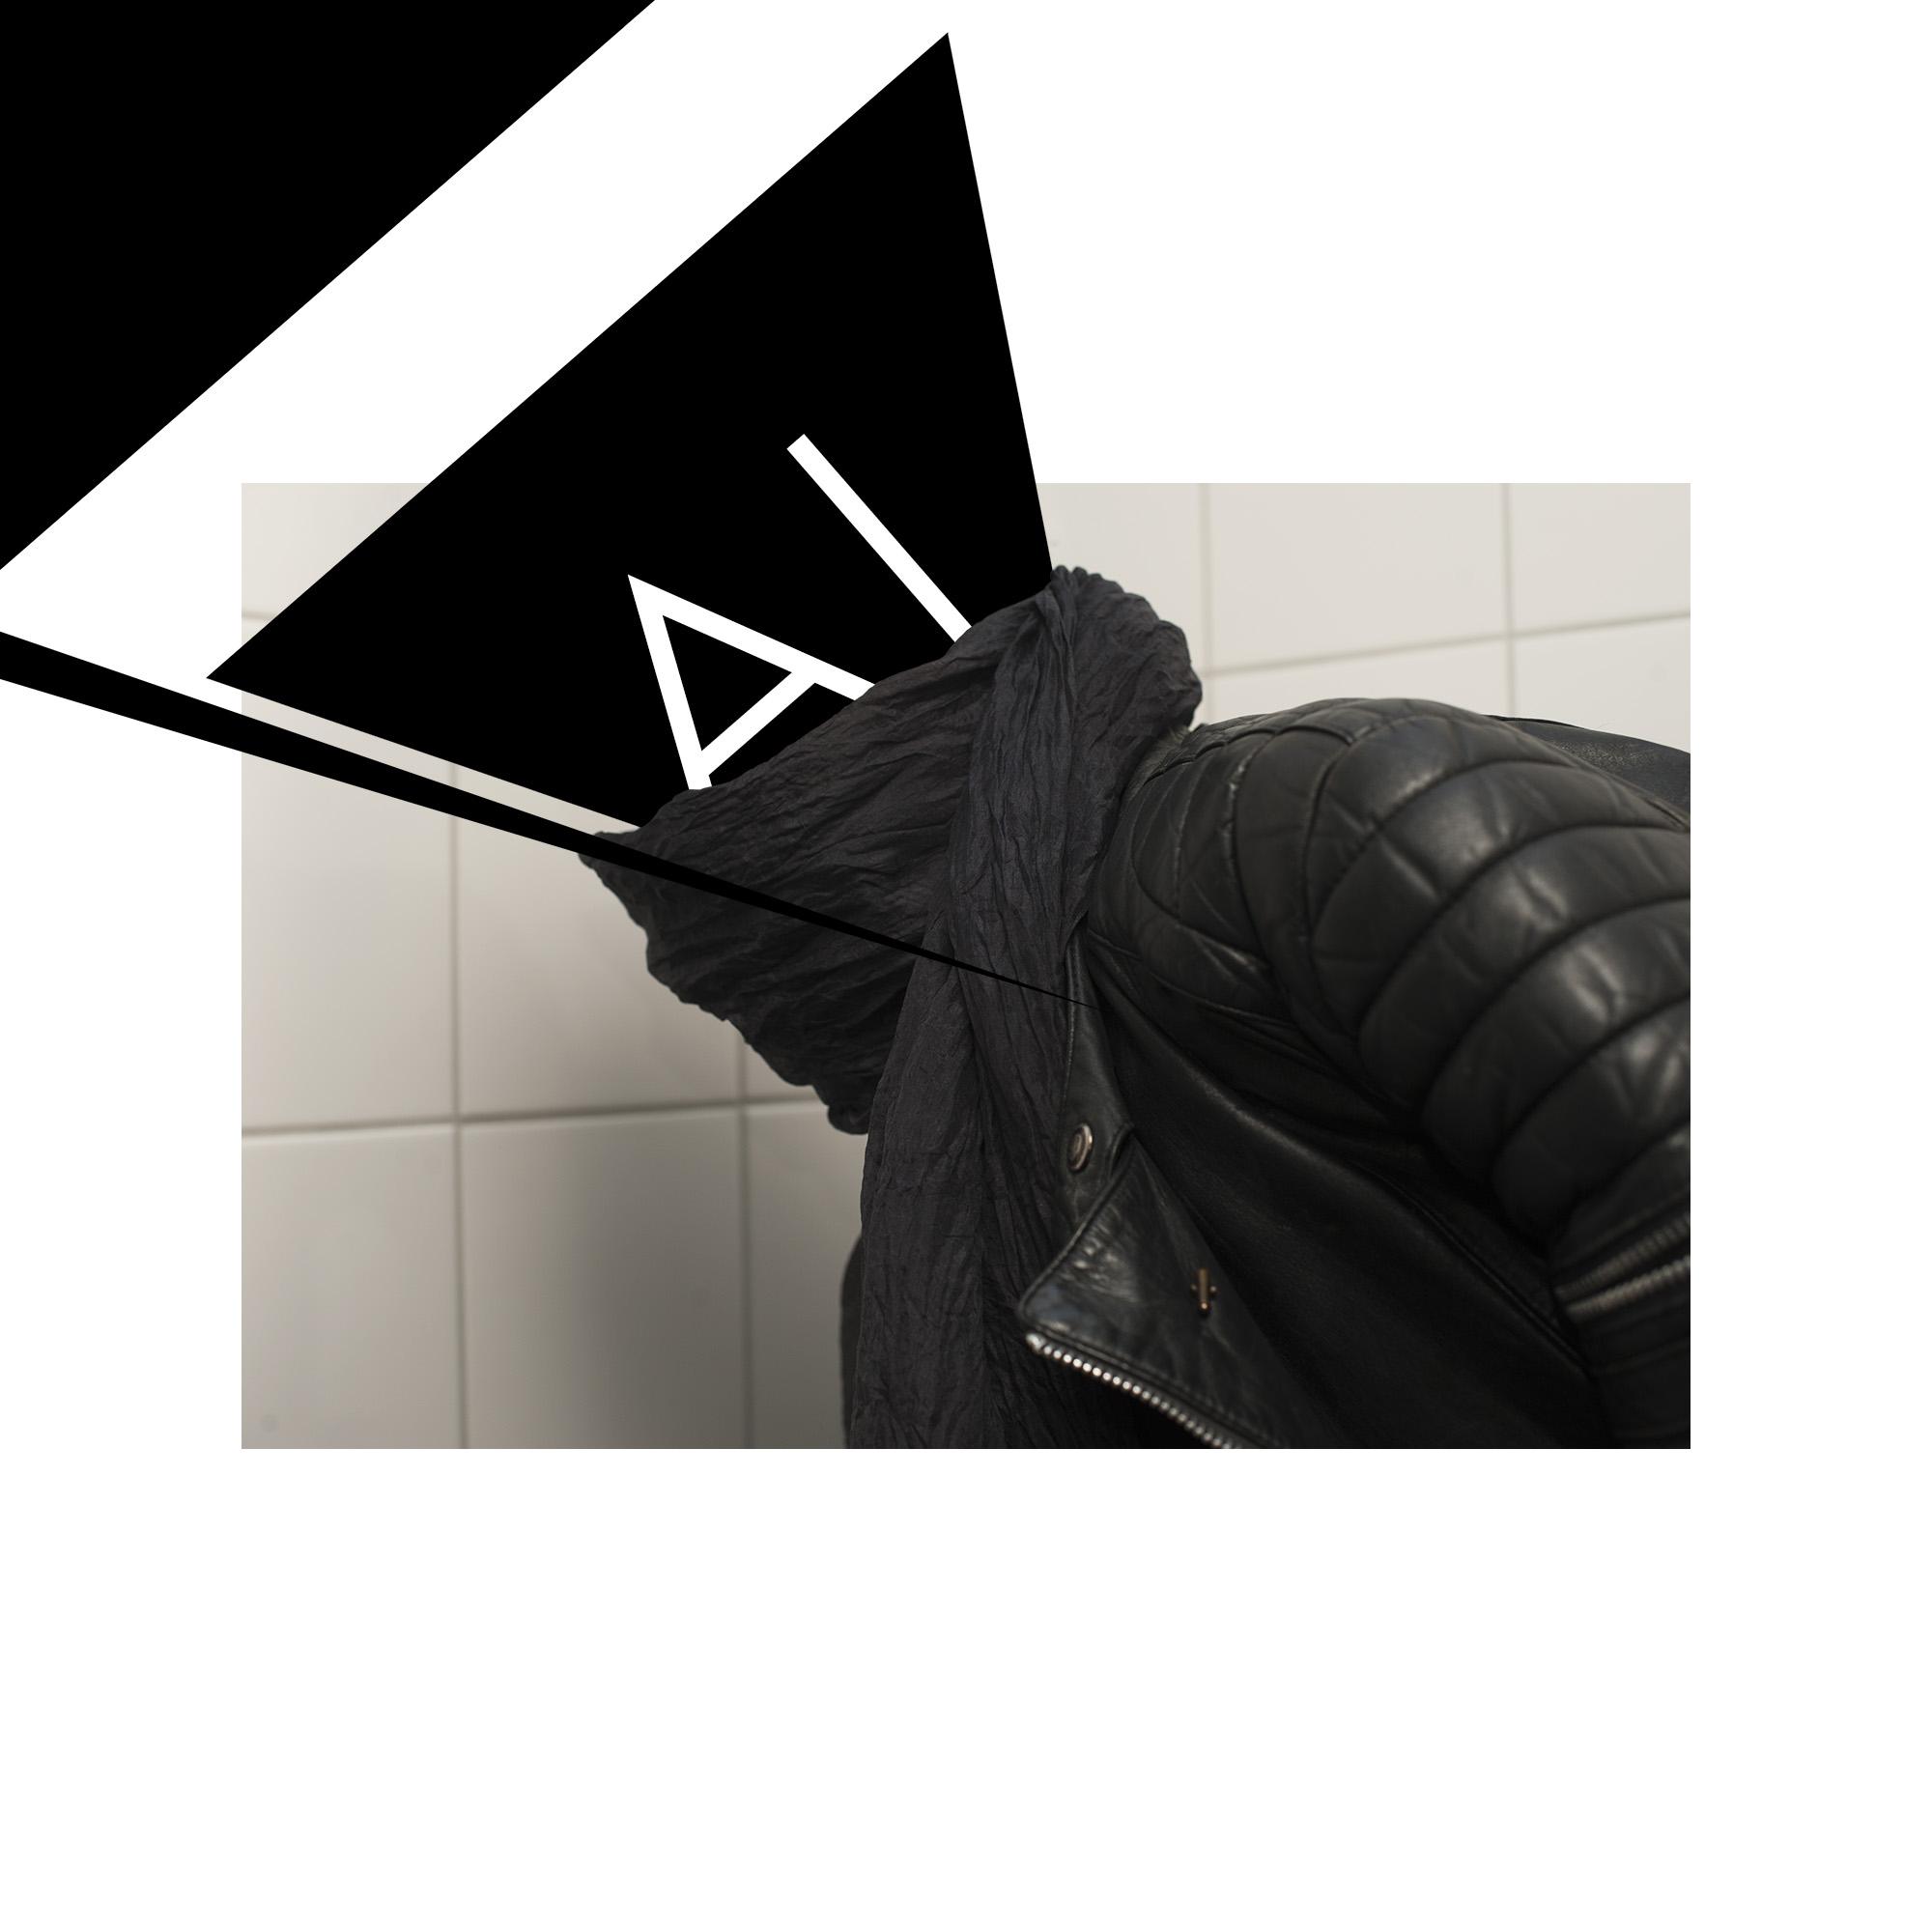 SATURDAY NIGHT SPECIAL 3a AFROilluminati Gear Campaign AI CAMEO LEATHER.jpg